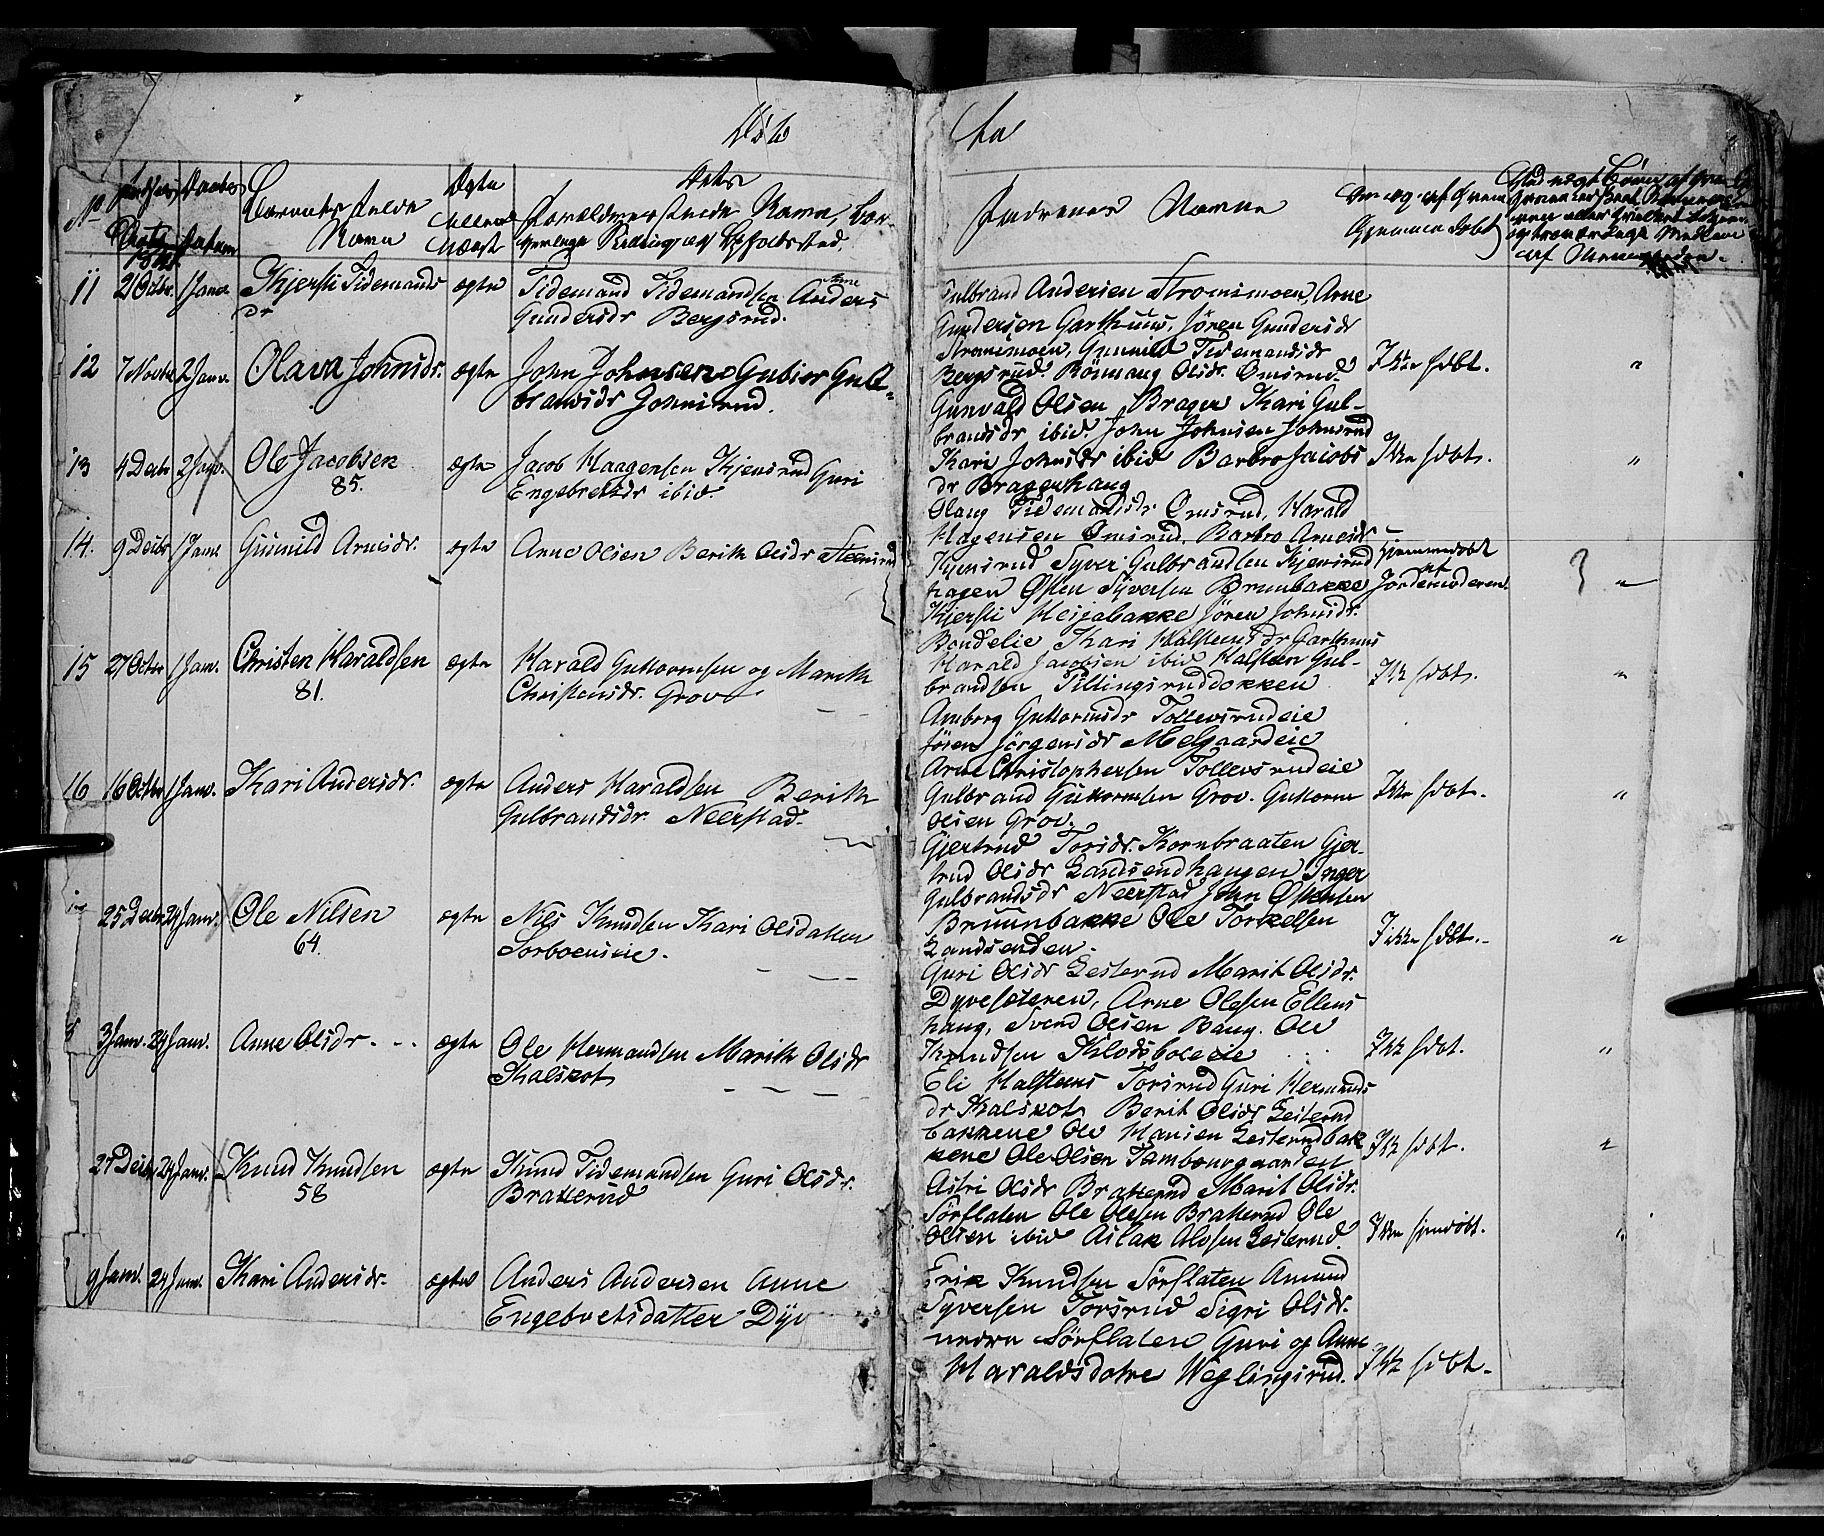 SAH, Sør-Aurdal prestekontor, Parish register (official) no. 4, 1841-1849, p. 3-4